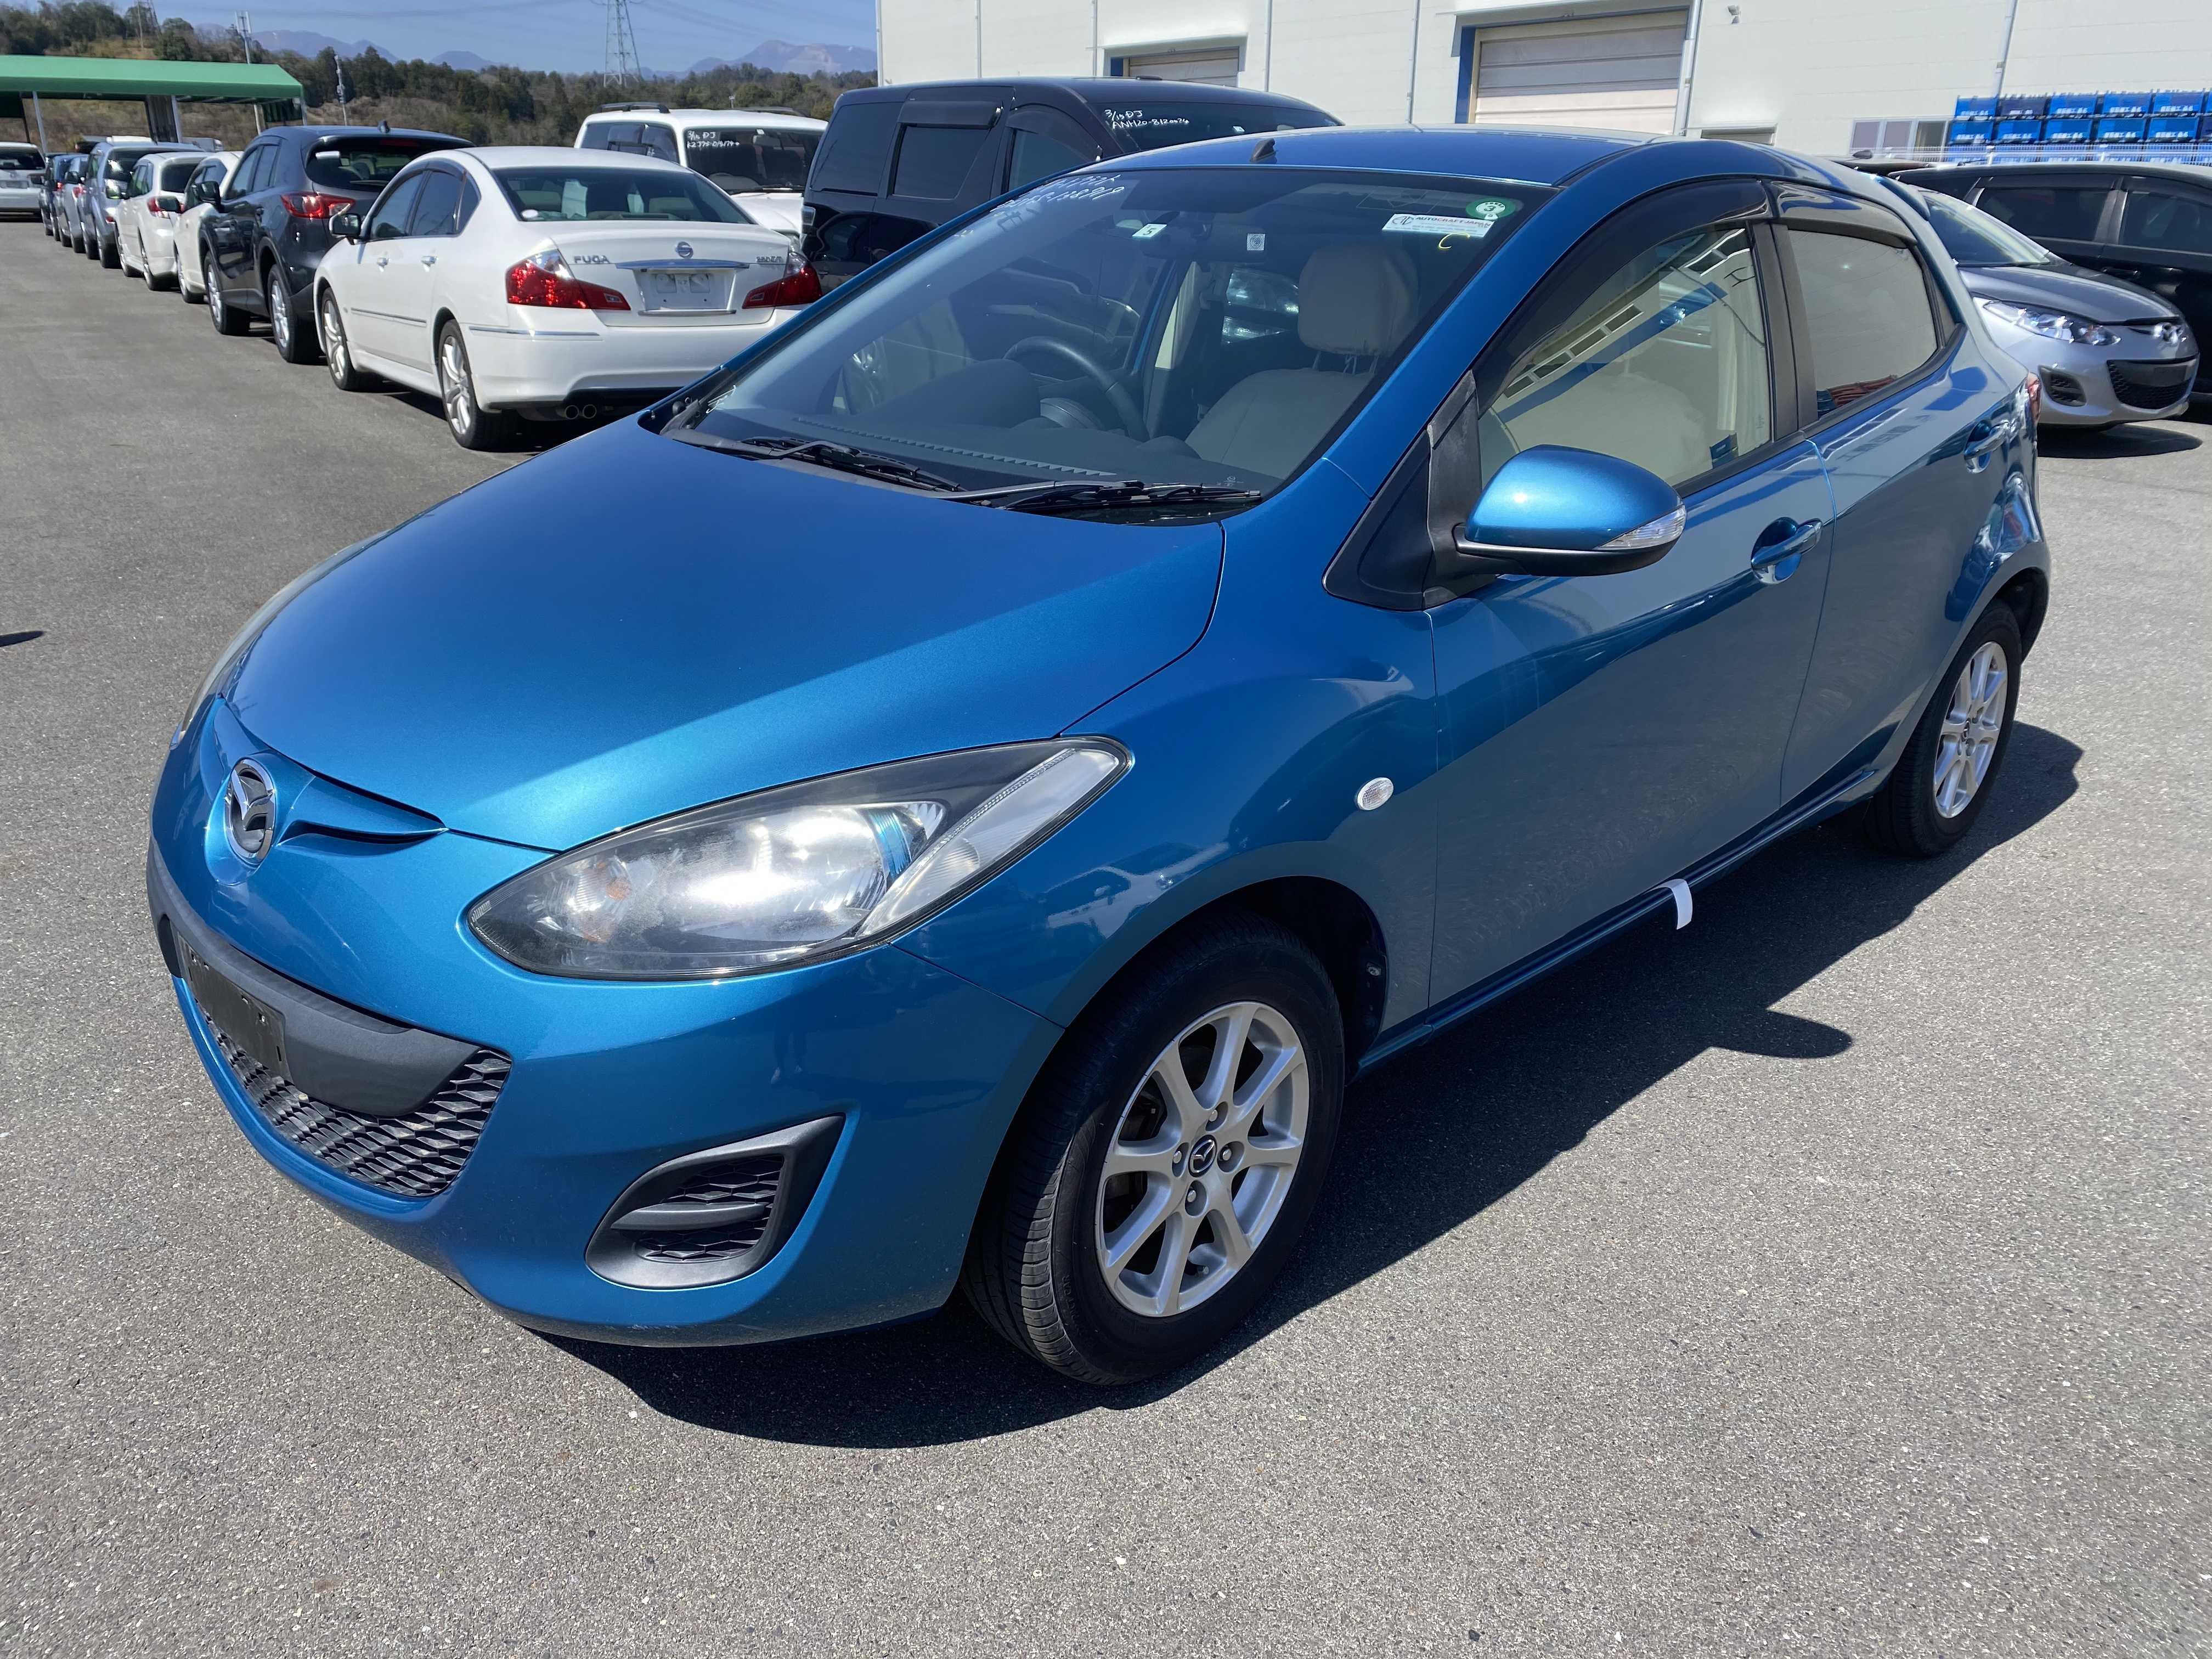 Mazda Demio 2011, BLUE, 1290cc, ATM - Autocraft Japan